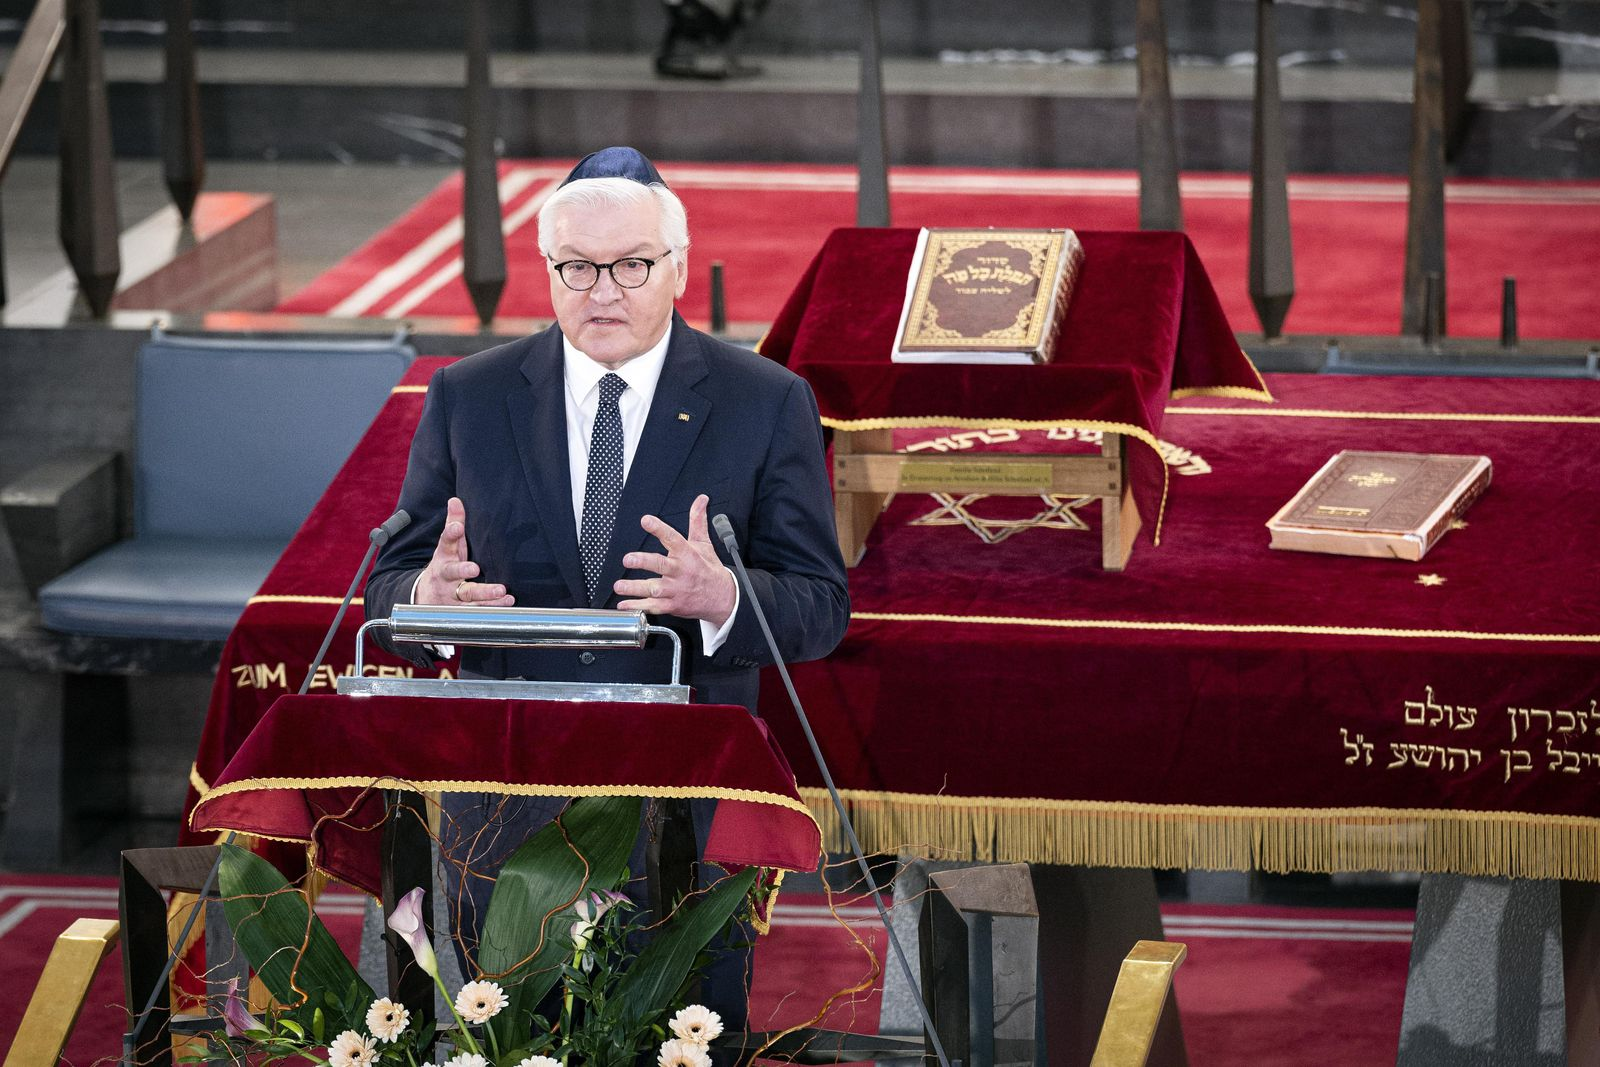 Steinmeier speech on '1700 years of Jewish life in Germany', Cologne - 16 Feb 2021